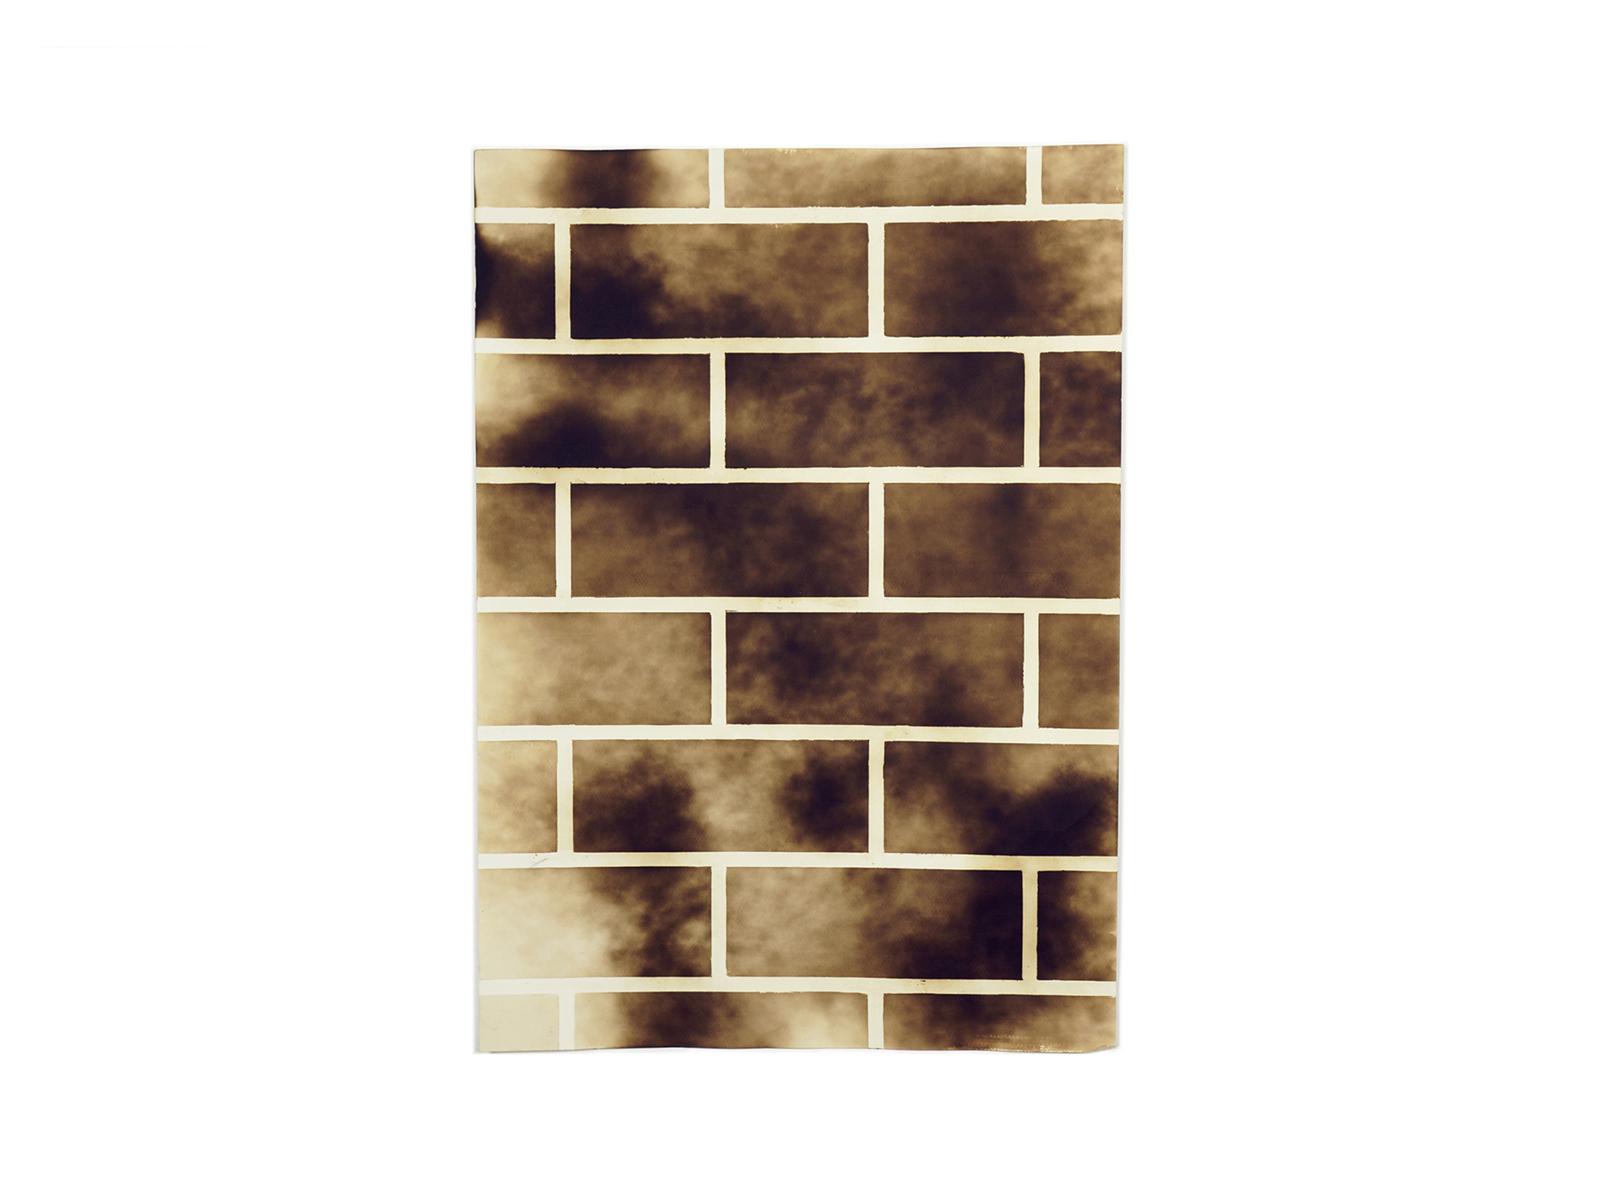 Benoit-Delaunay-artiste-dessins-2012-structure-02